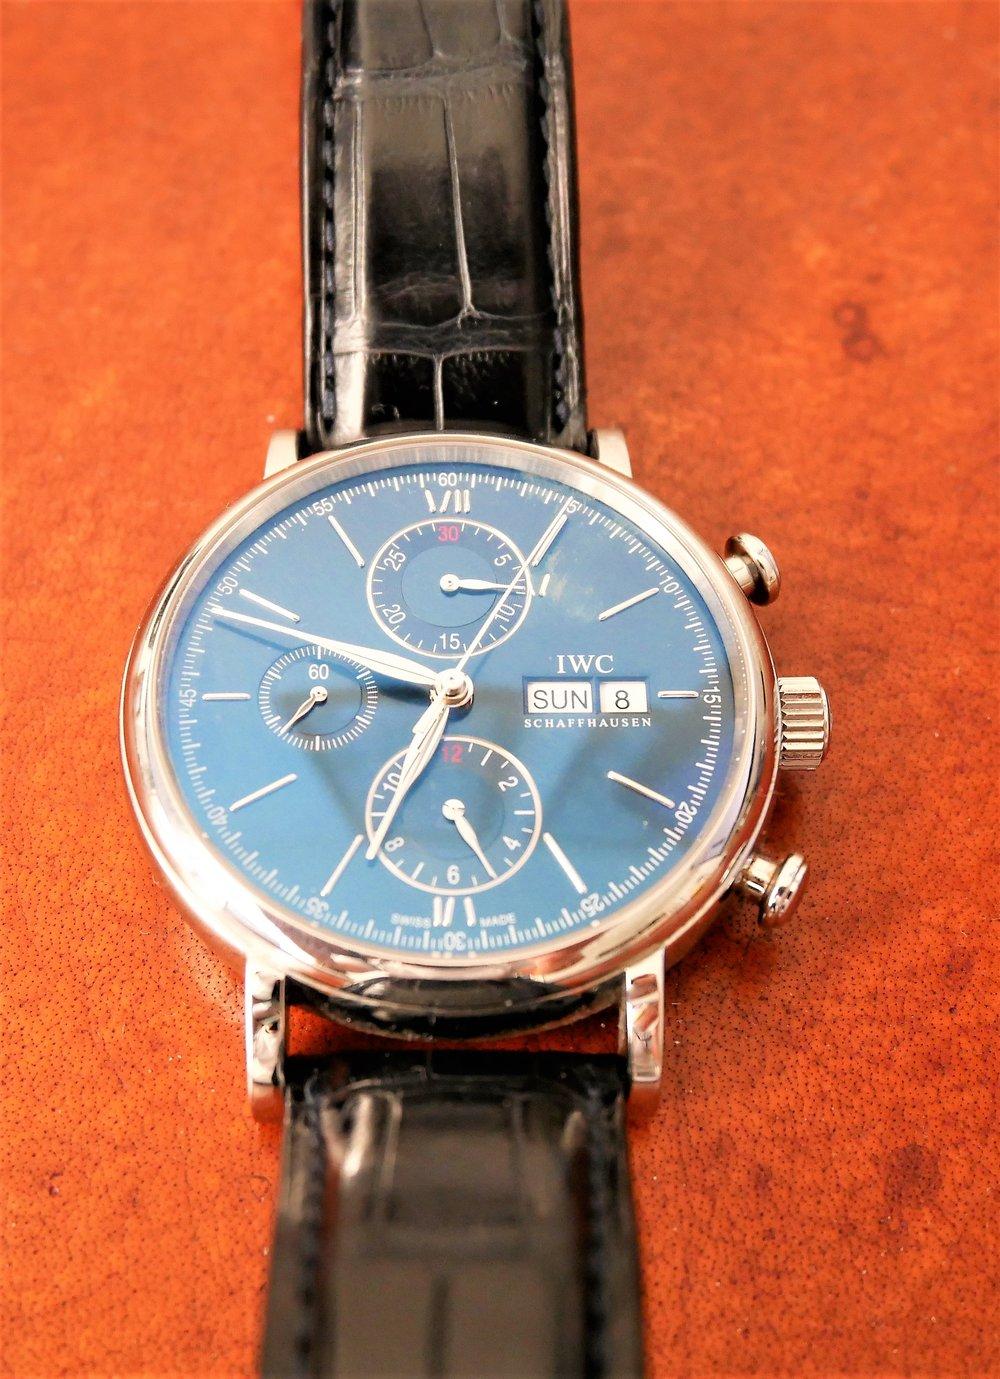 IWC Portofino Timepiece